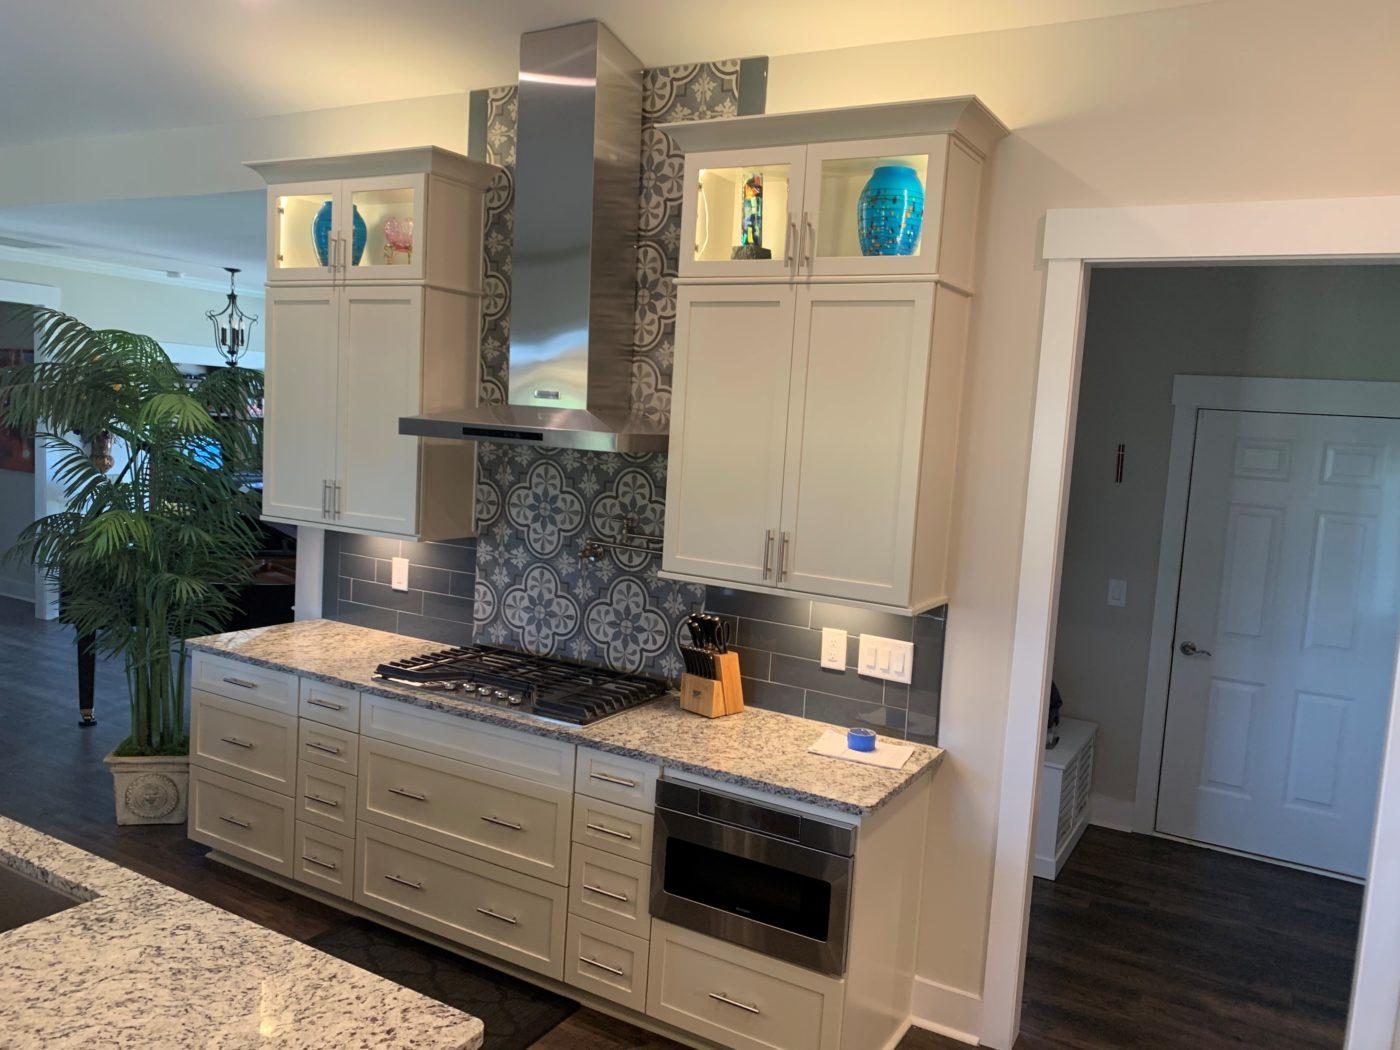 Kitchen Cabinets Raleigh Transitional Contemporary Savannah1 Glass Granite Hardware